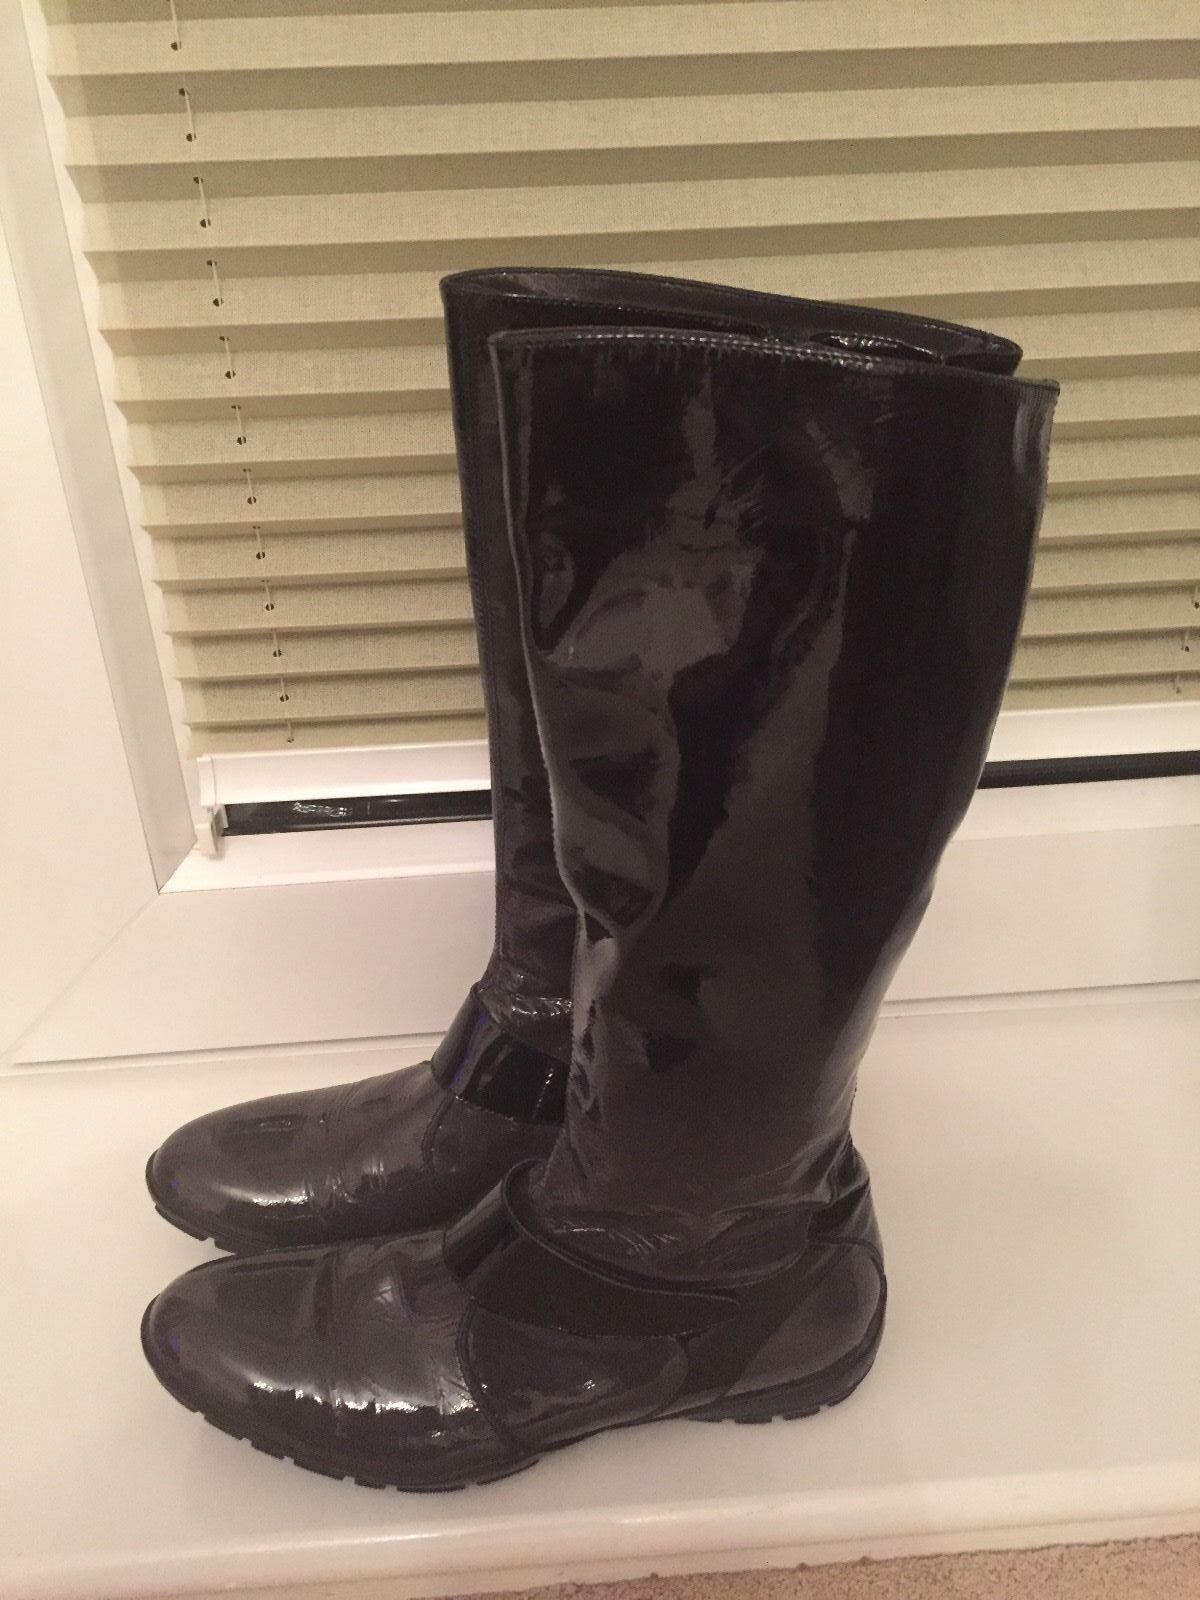 Baldinini Italian Stiefel, schuhe soft patent Leder Größe 38, soft schuhe 5UK Grau & schwarz 8c89f0